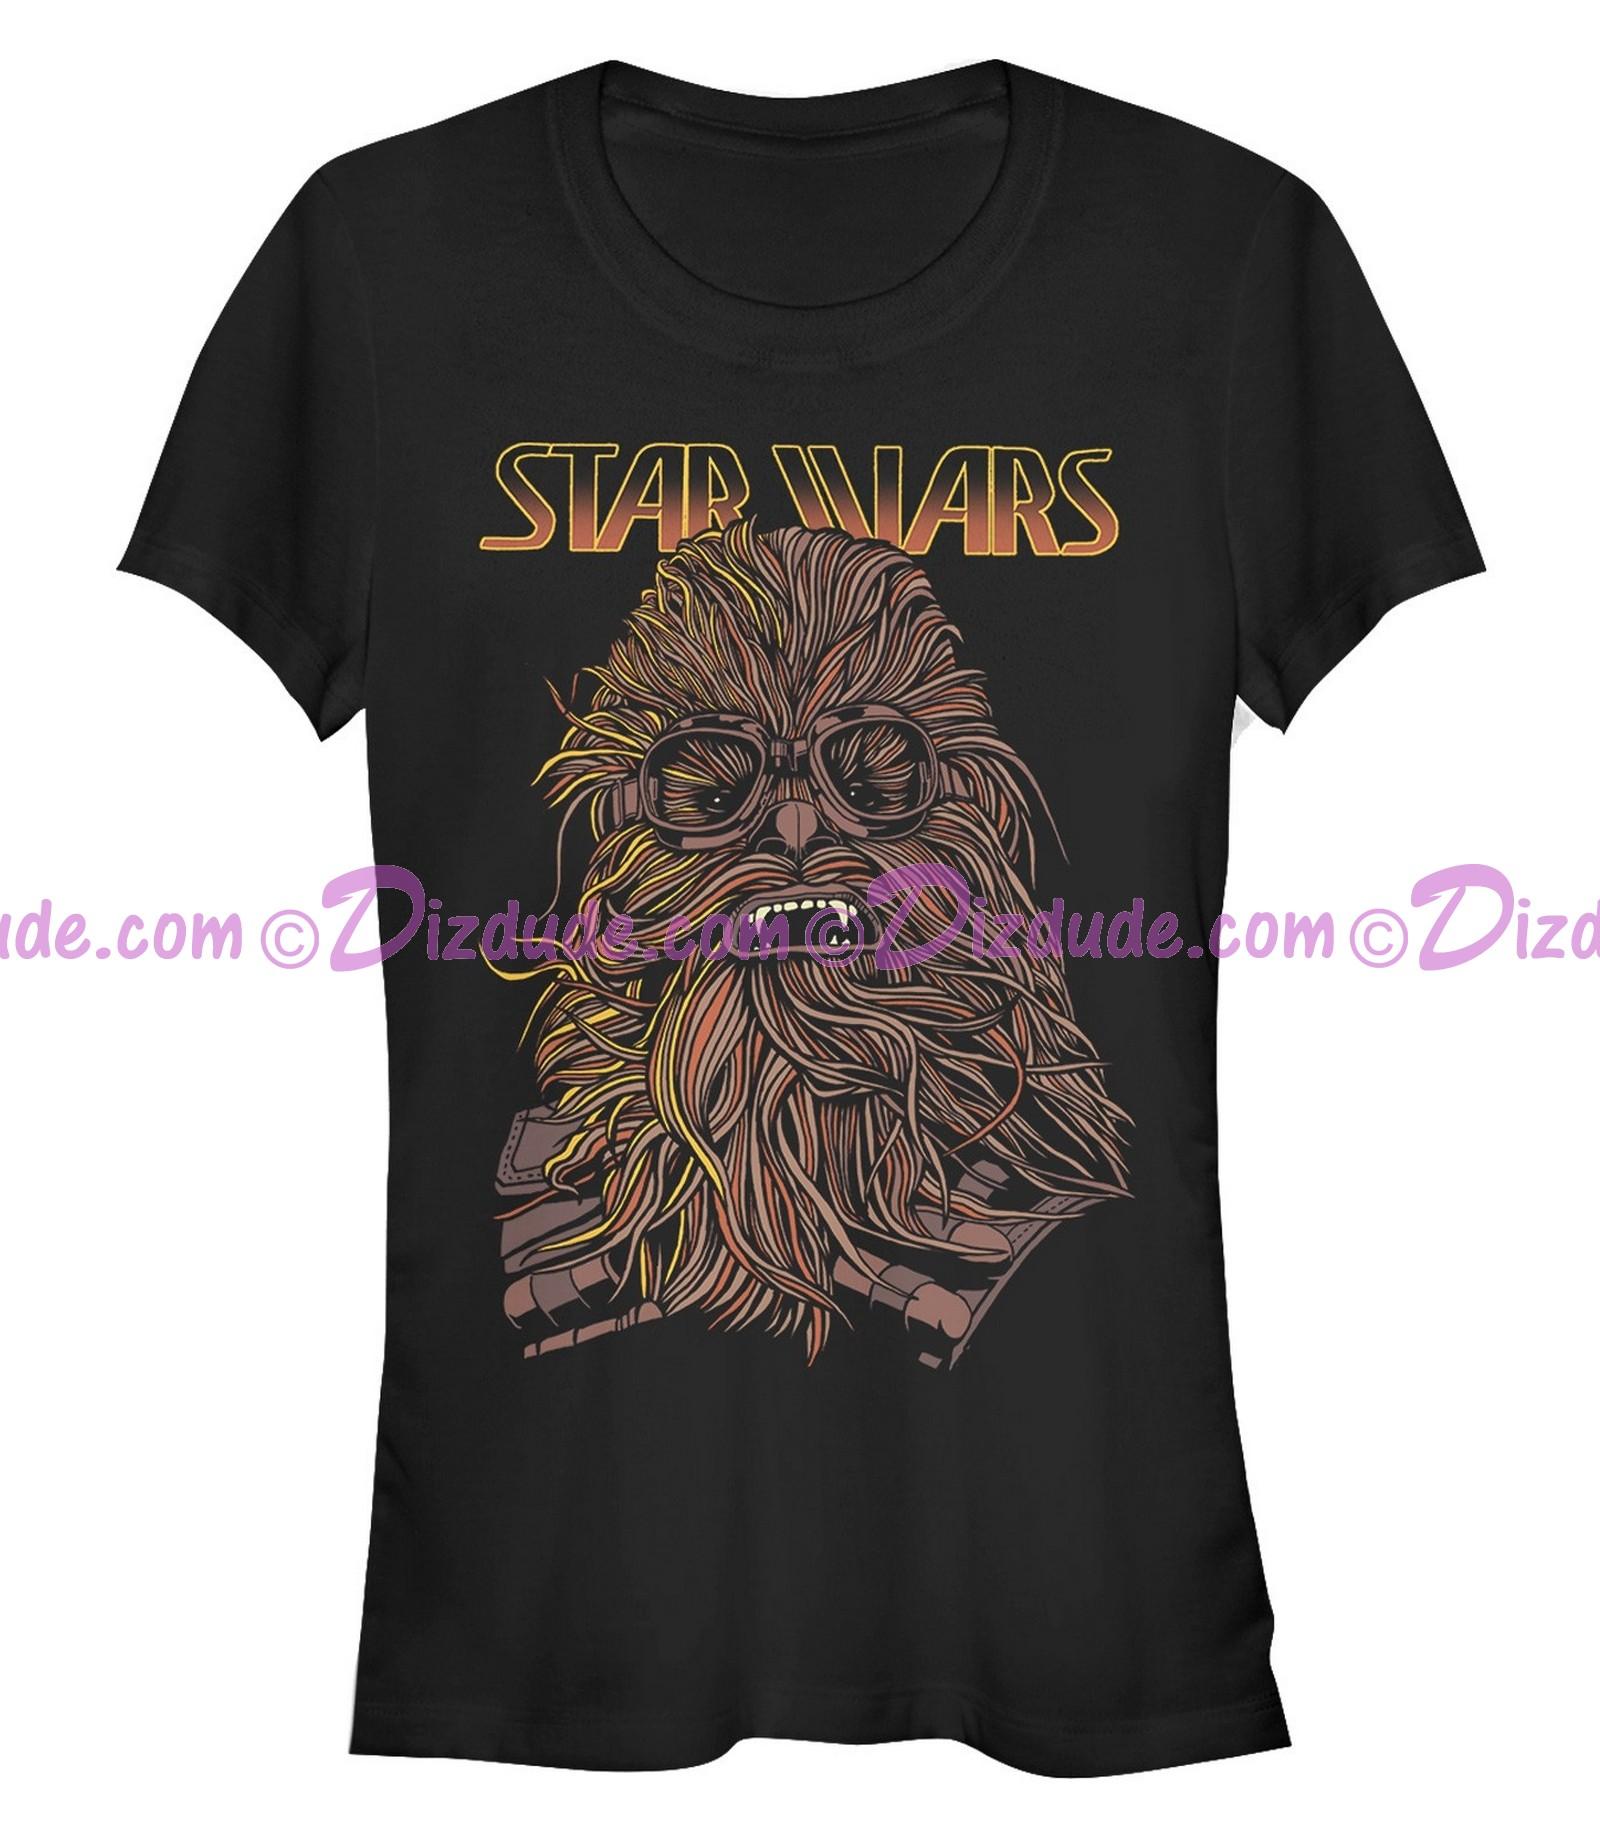 SOLO A Star Wars Story Cartoon Chewie Juniors T-Shirt (Tshirt, T shirt or Tee)  © Dizdude.com